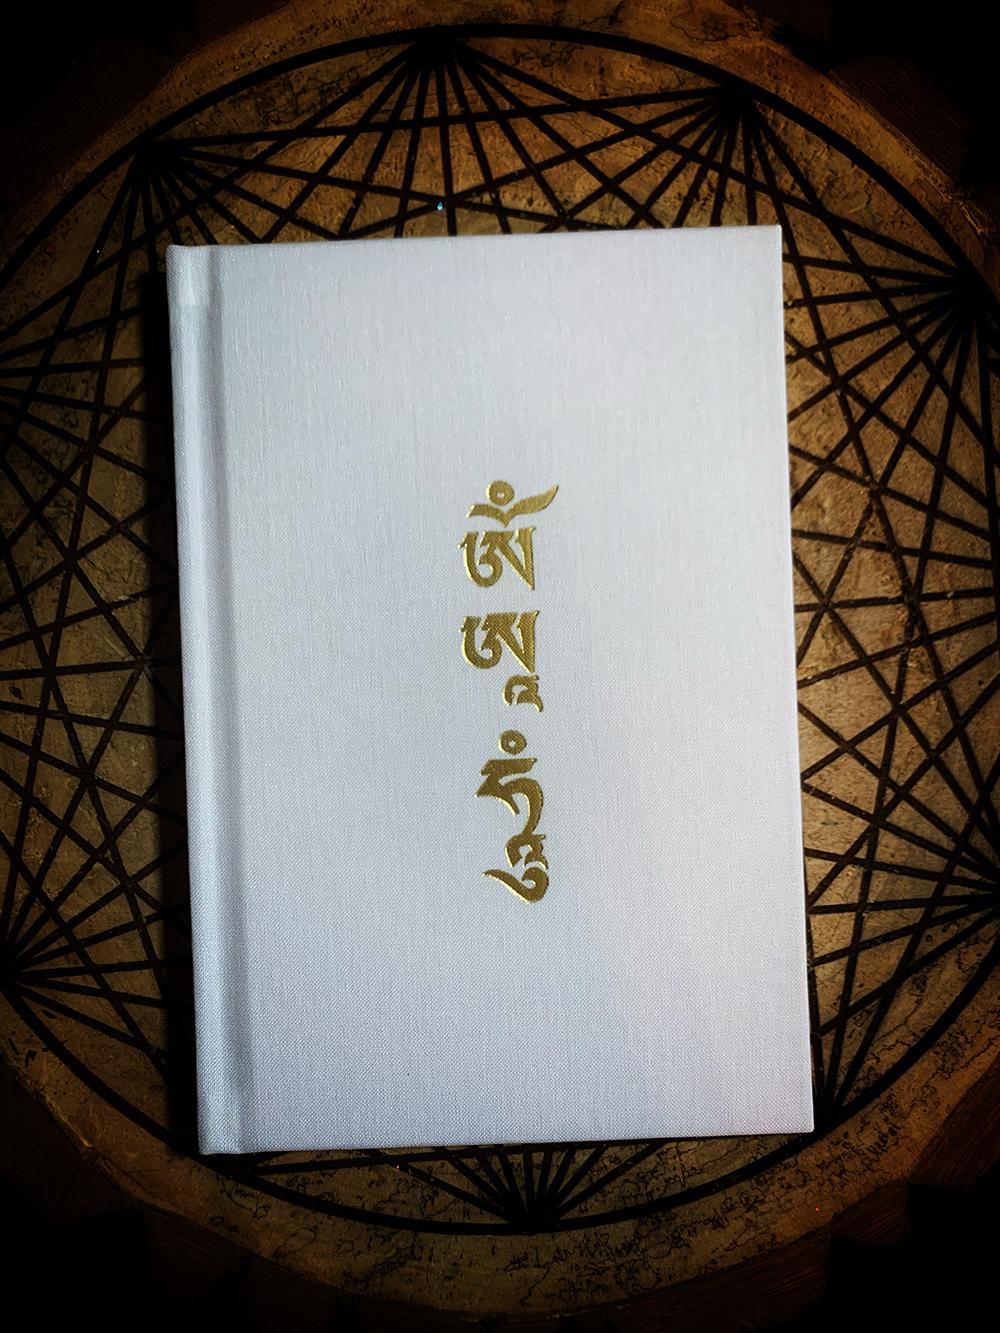 Sharp Practice The Ritual Dagger in Bön Sorcery and Vajrayana Buddhism